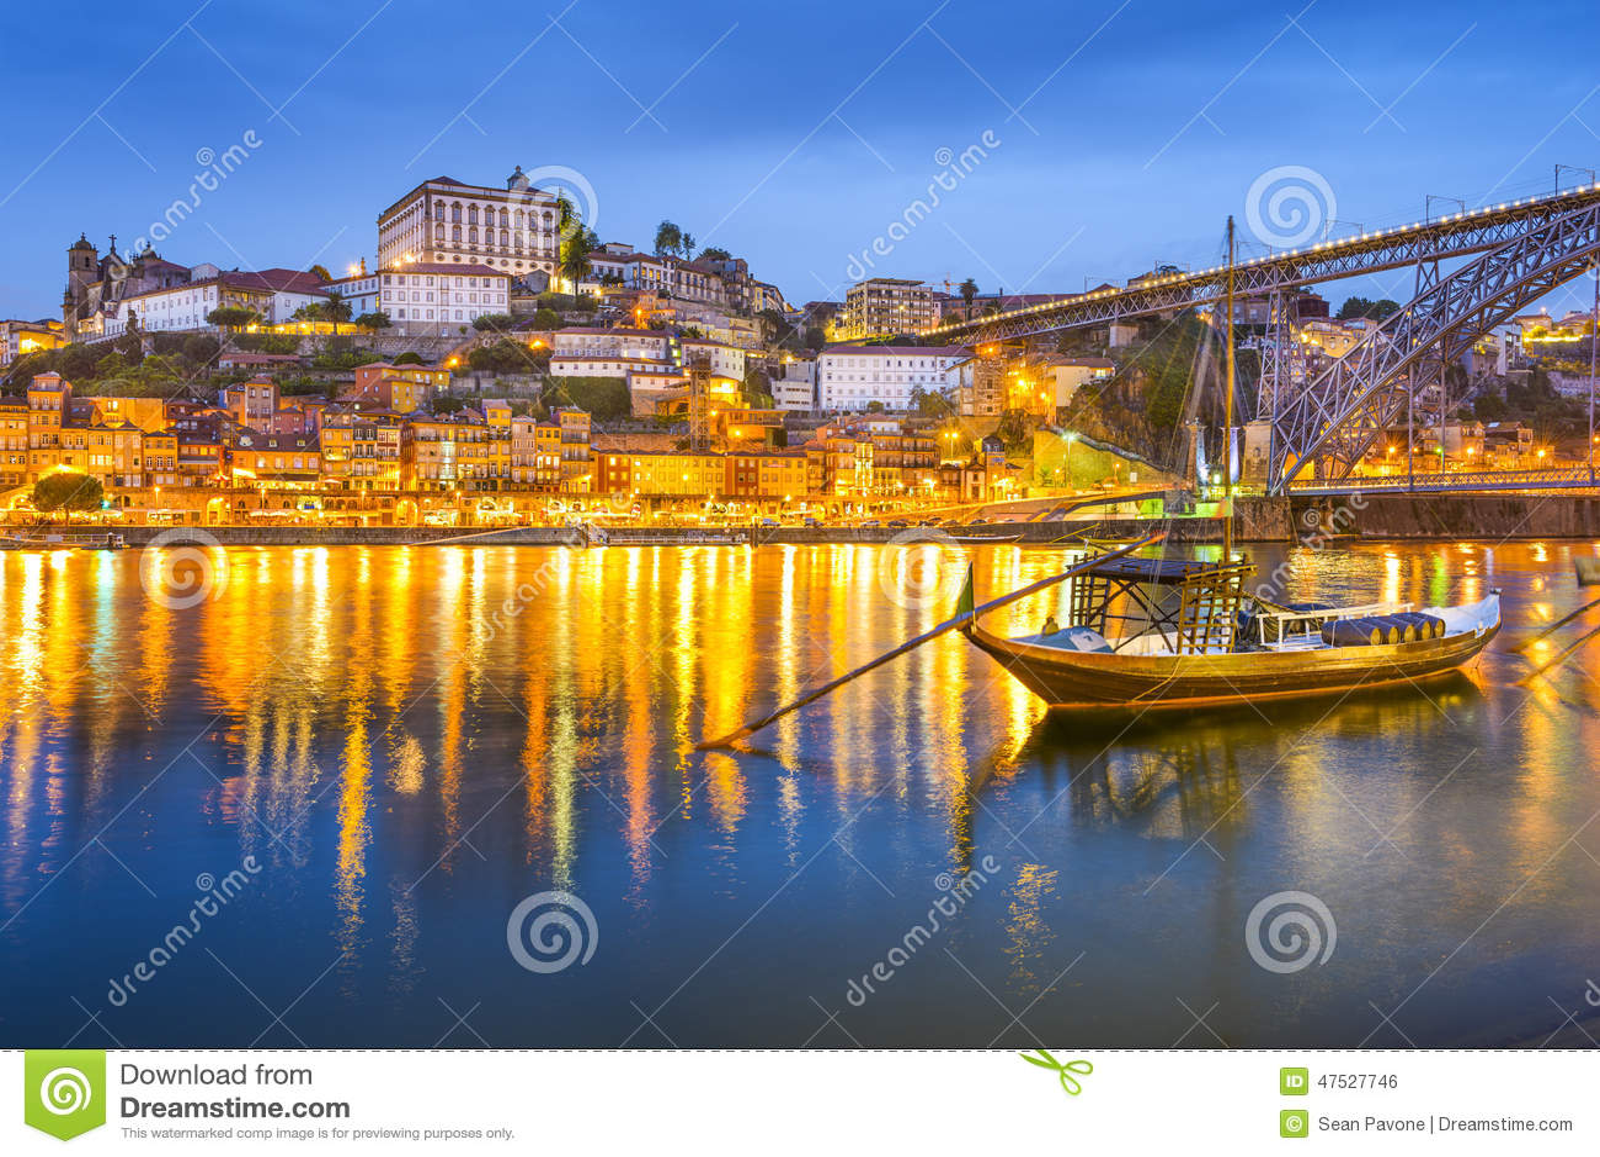 porto paysage urbain du portugal photo stock image du soir e destination 47527746. Black Bedroom Furniture Sets. Home Design Ideas